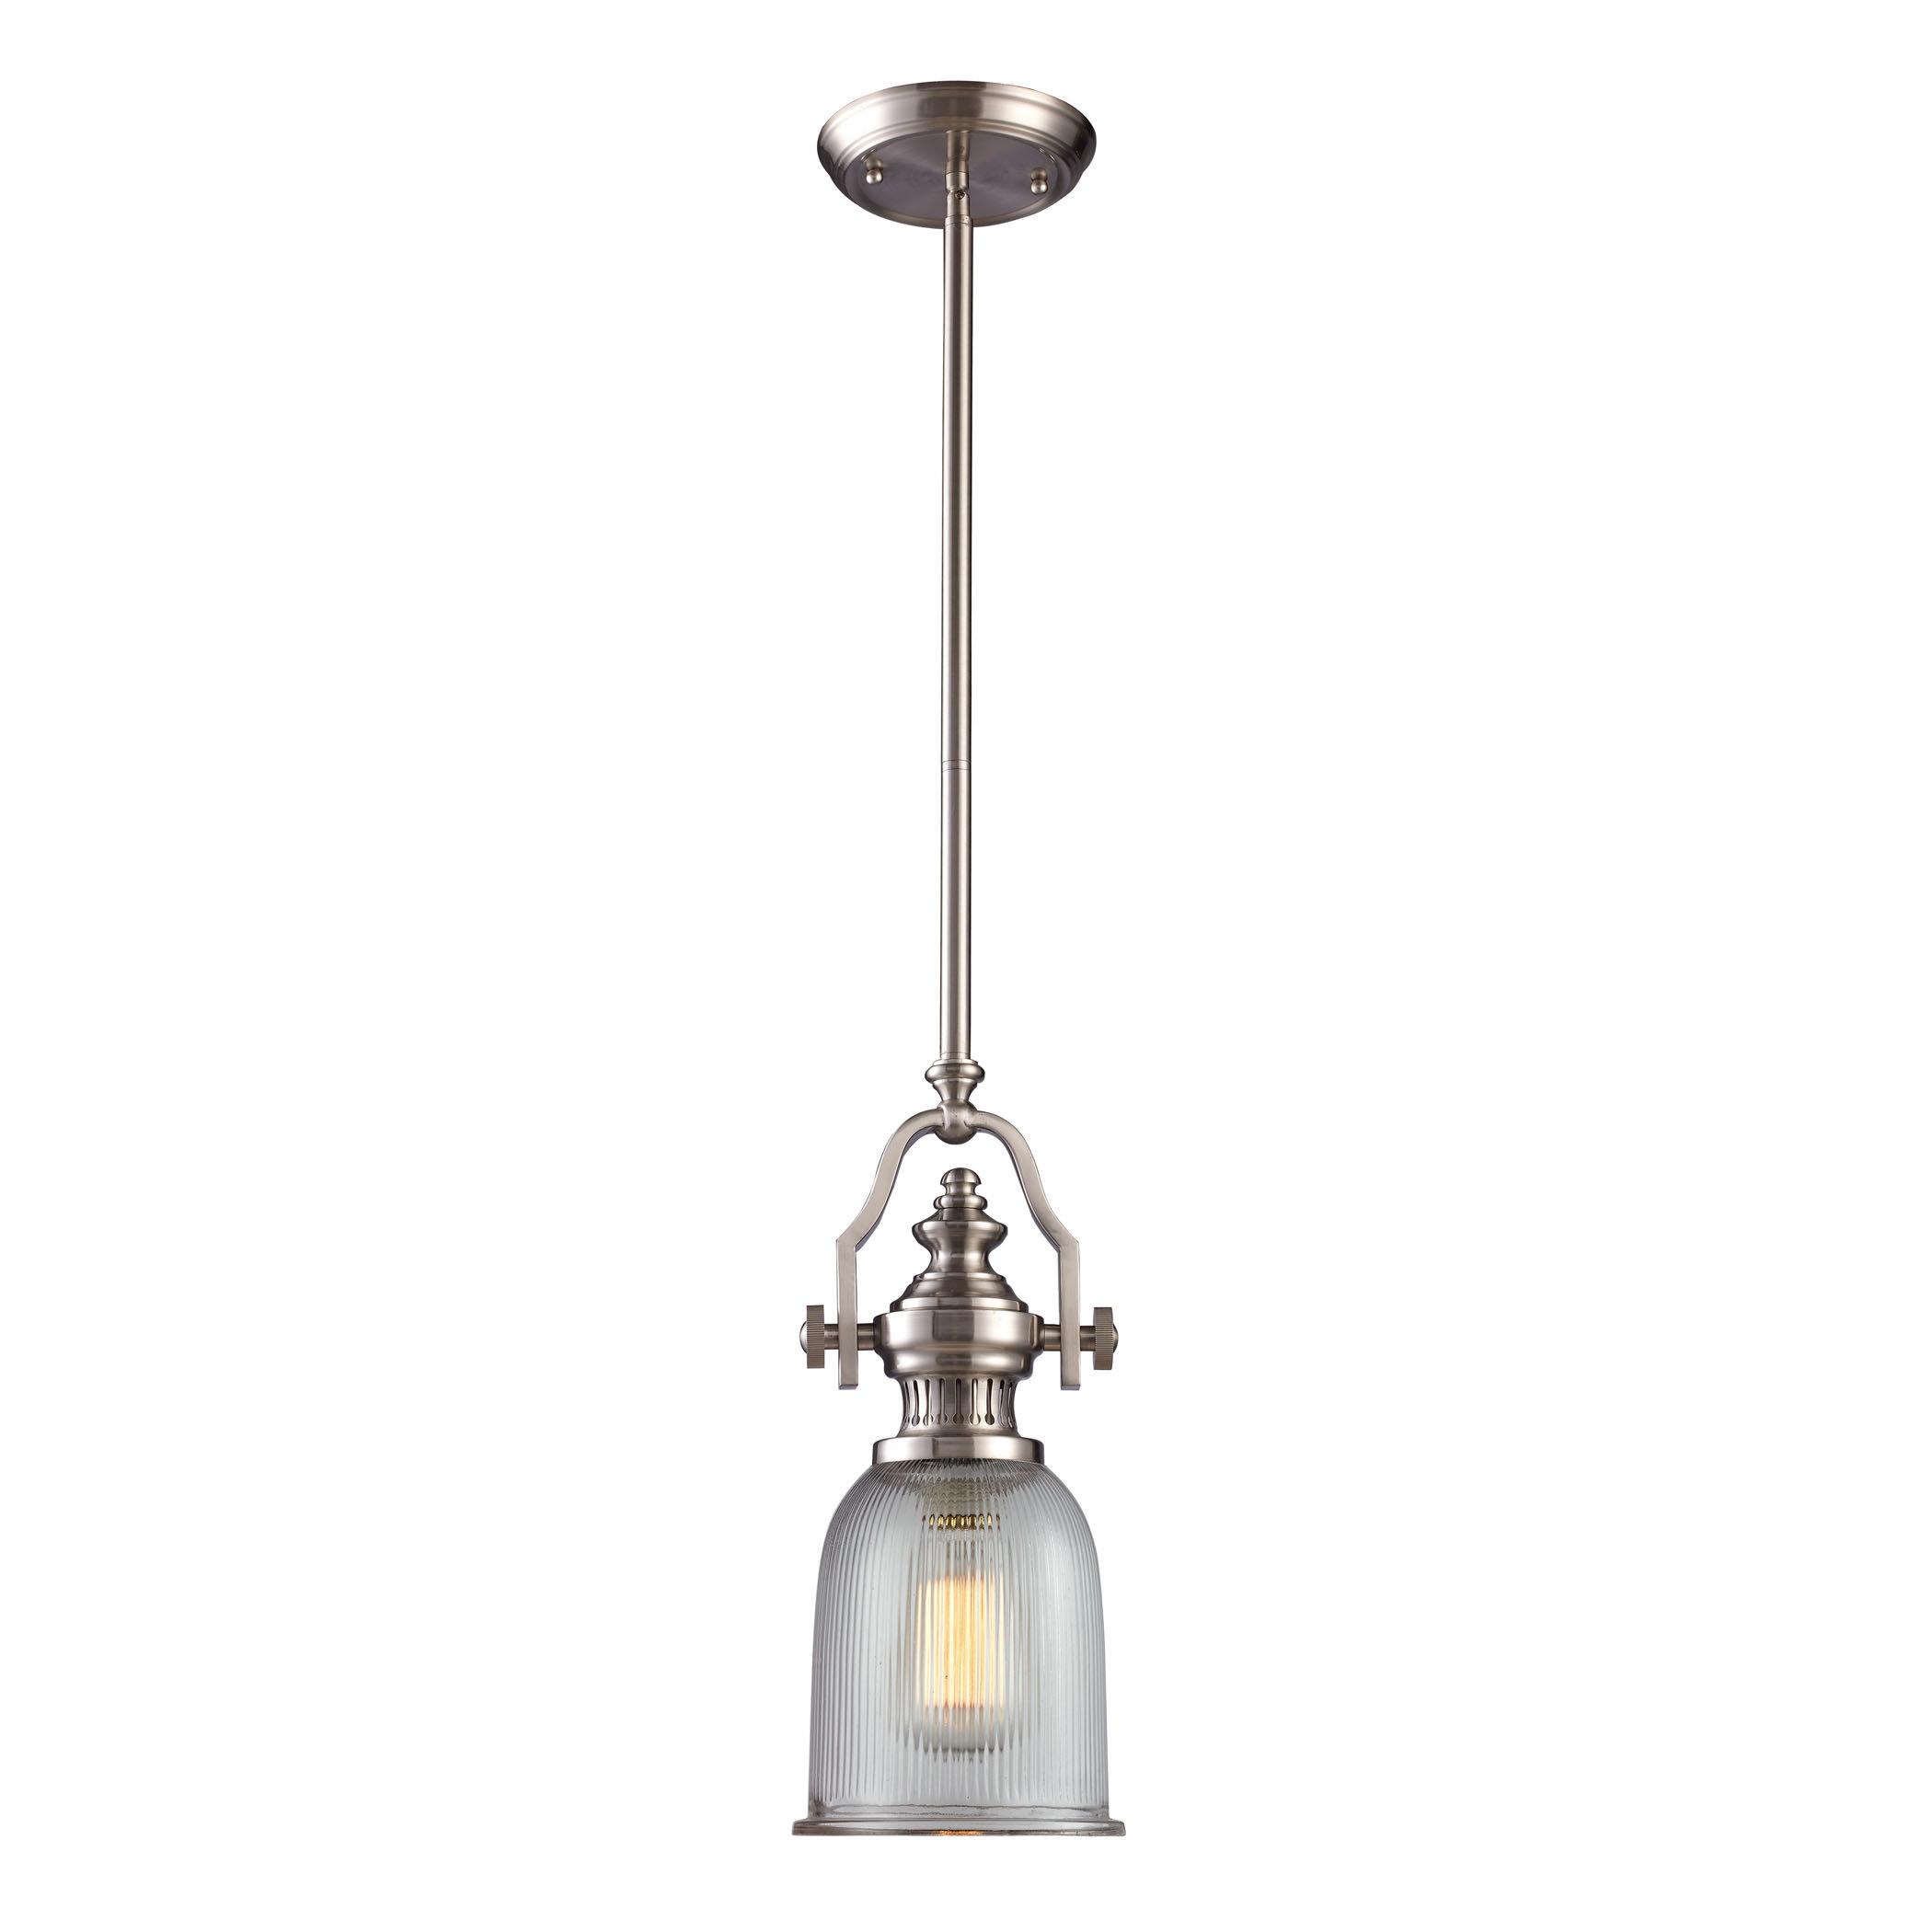 Birch Lane™ Heritage Erico 1 Light Single Bell Pendant Throughout Carey 1 Light Single Bell Pendants (View 5 of 30)